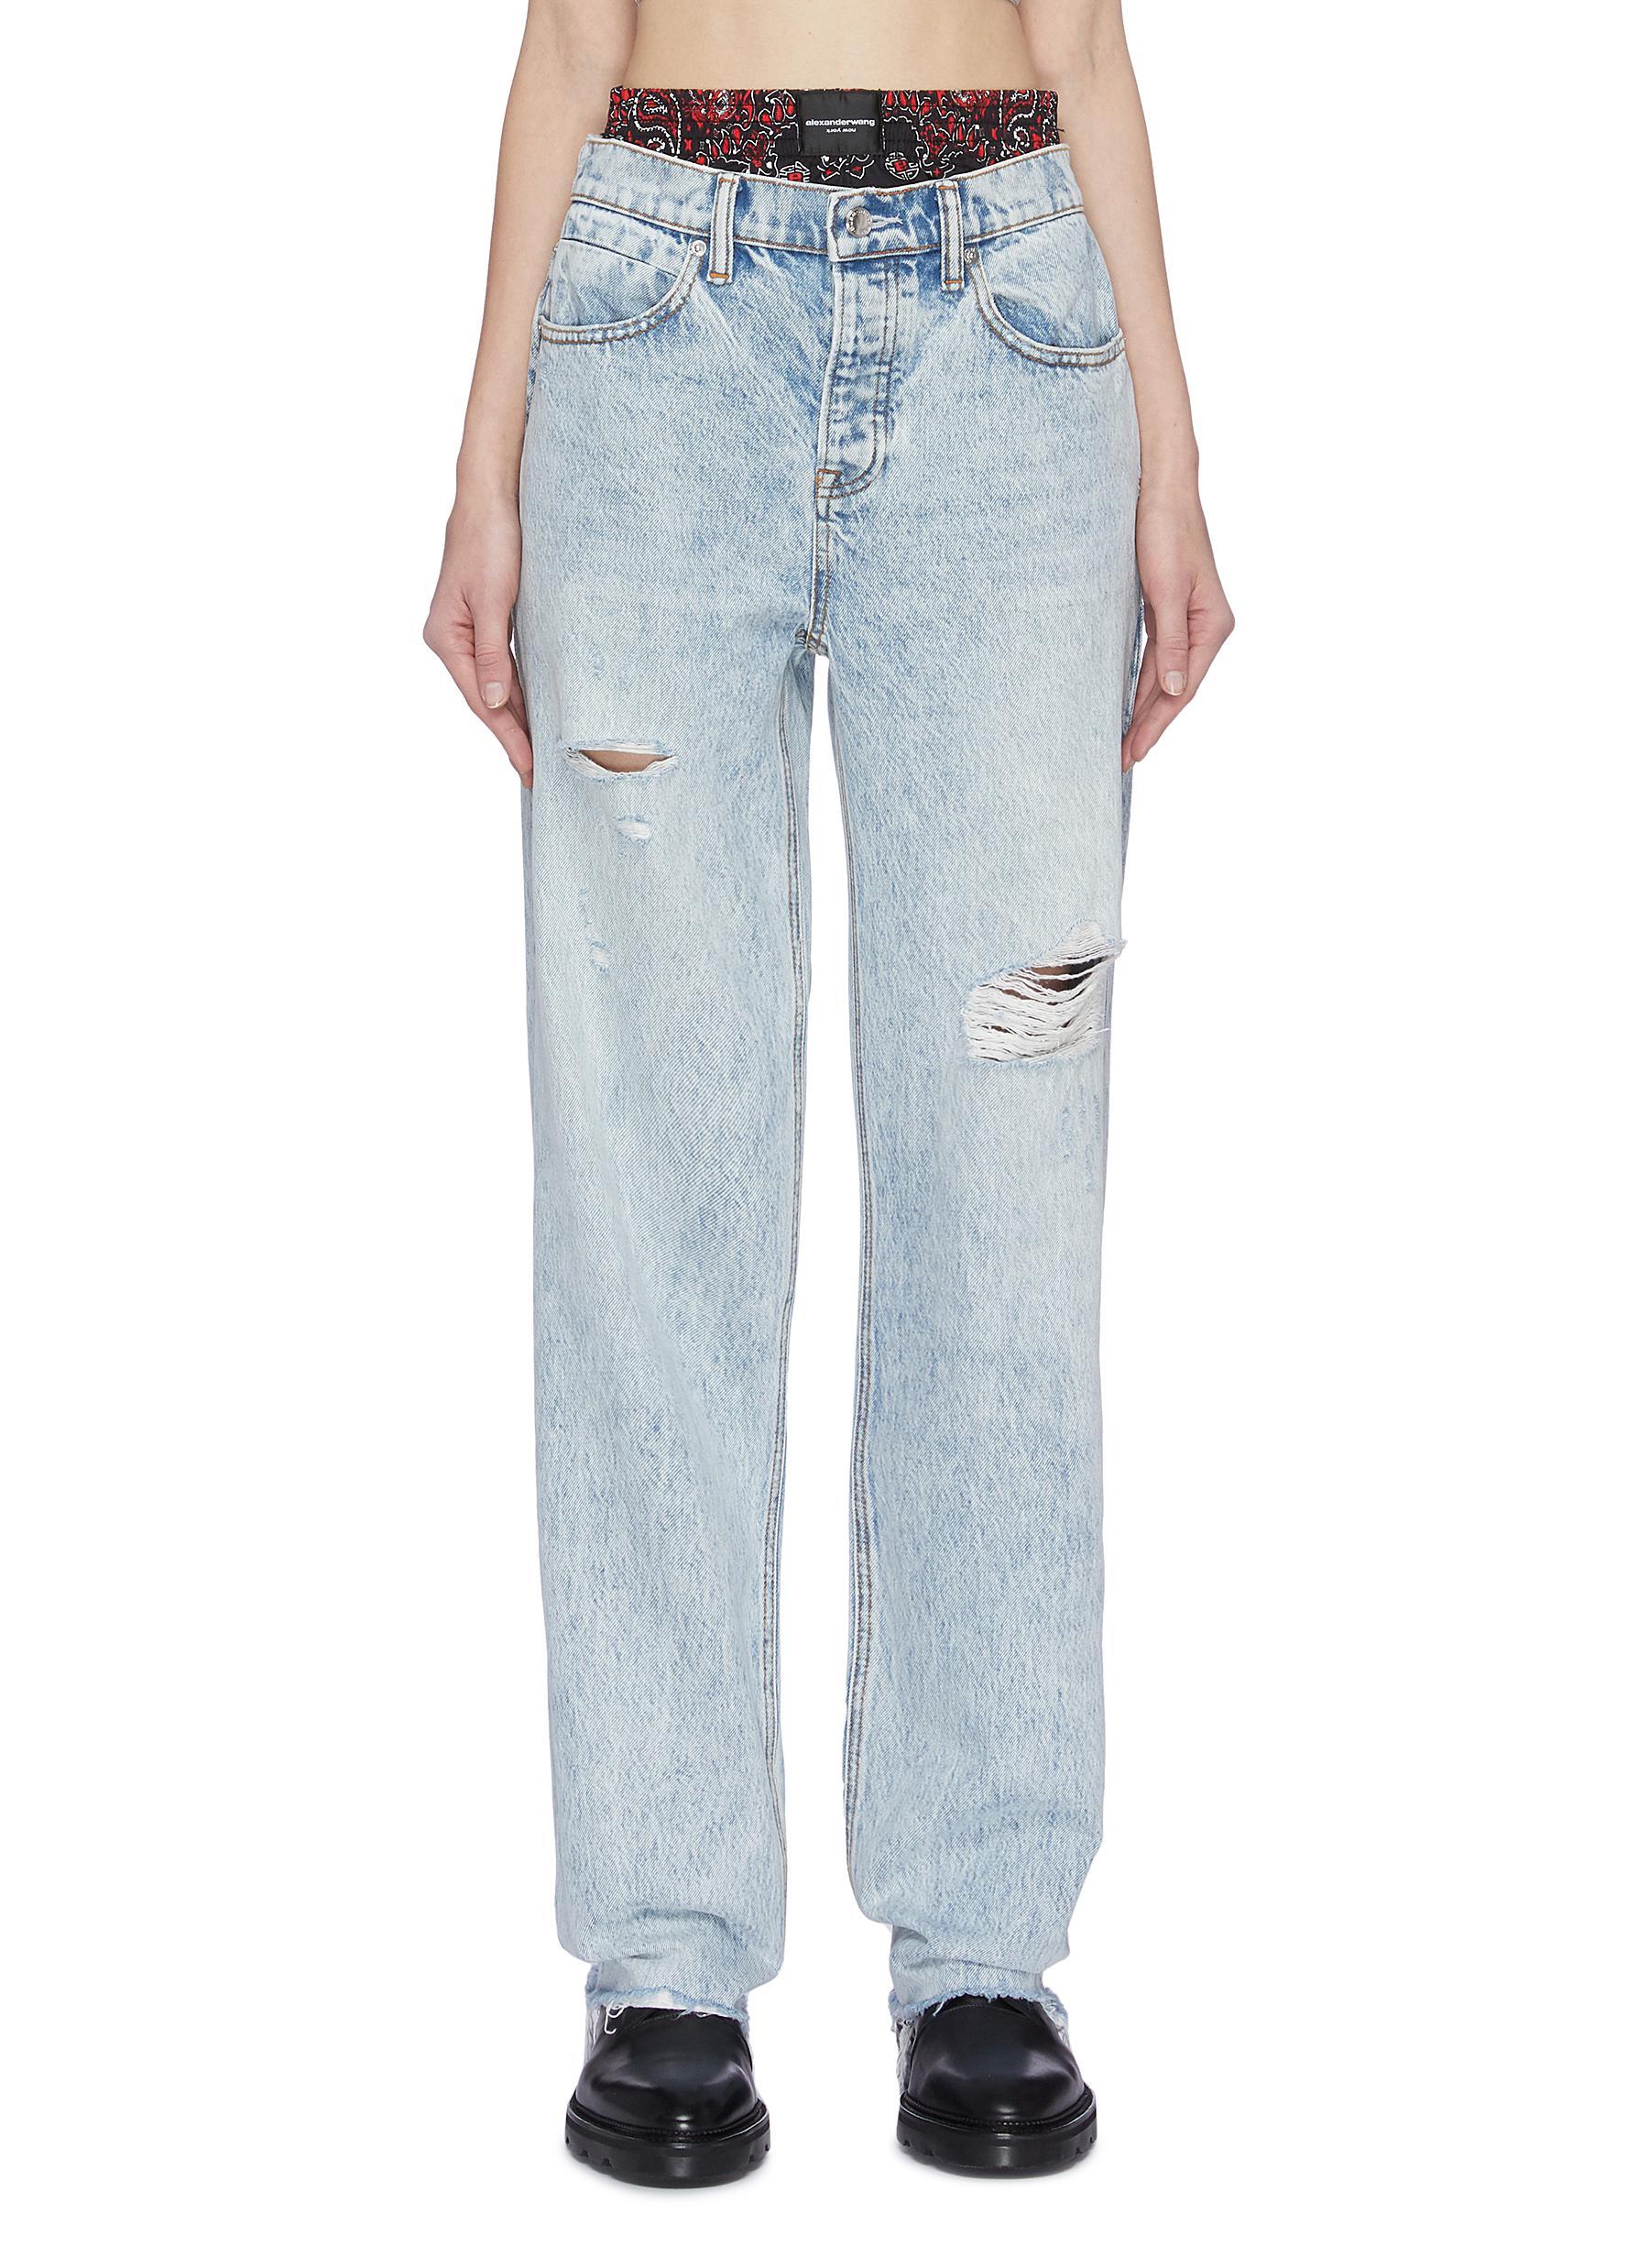 Buy Alexander Wang Jeans 'Rival' bandana print underlayer distressed jeans